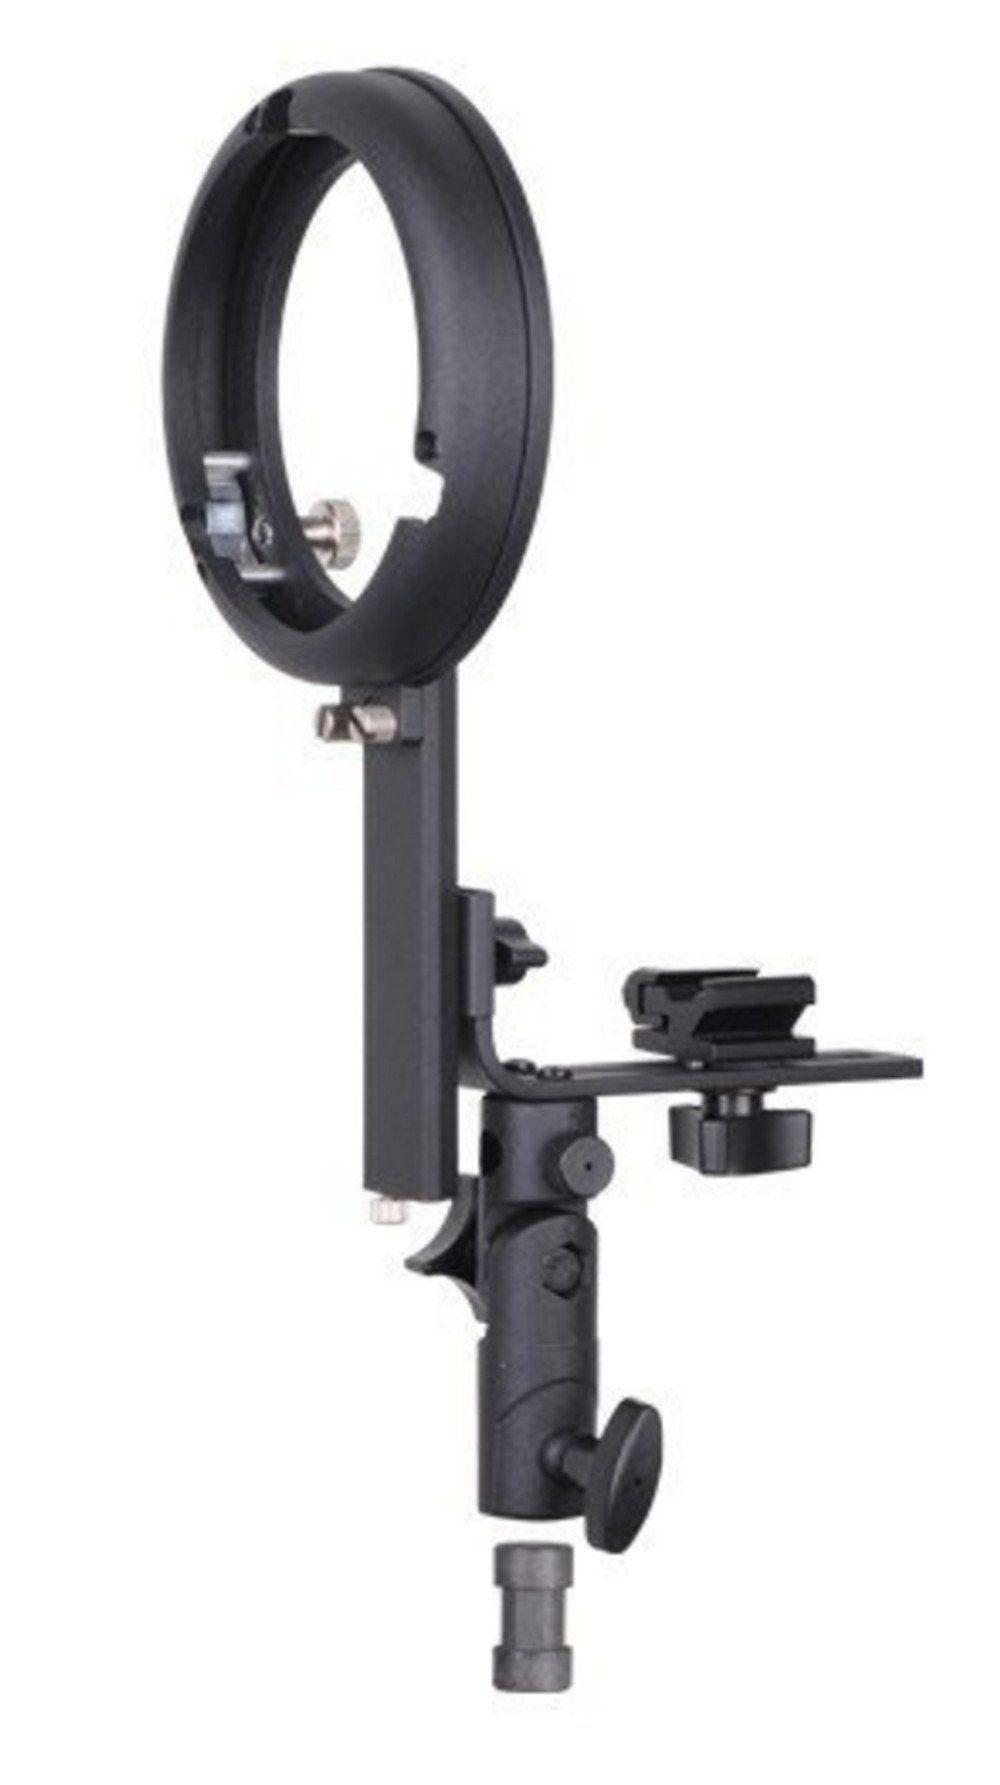 Bresser Fotostudio »Kamerablitzhalter mit S-Bajonett Zubehöradapter«